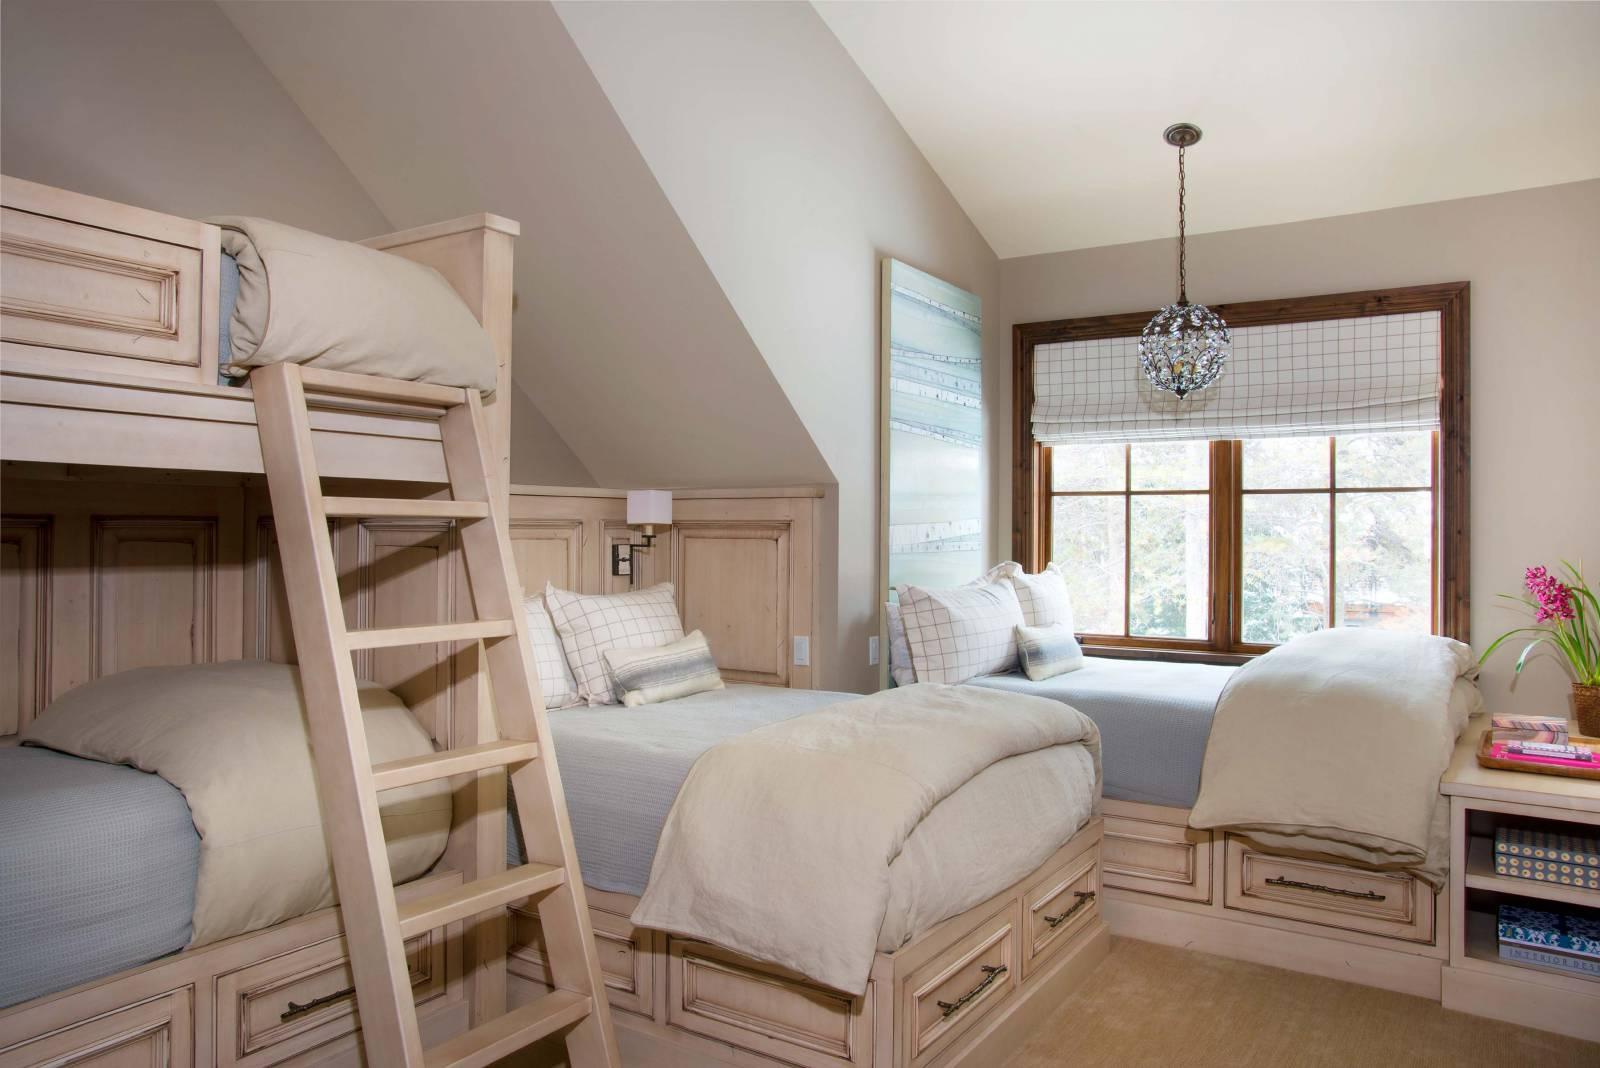 Beautiful Bunk Room Ideas Part - 14: Hadley_BunkRoom